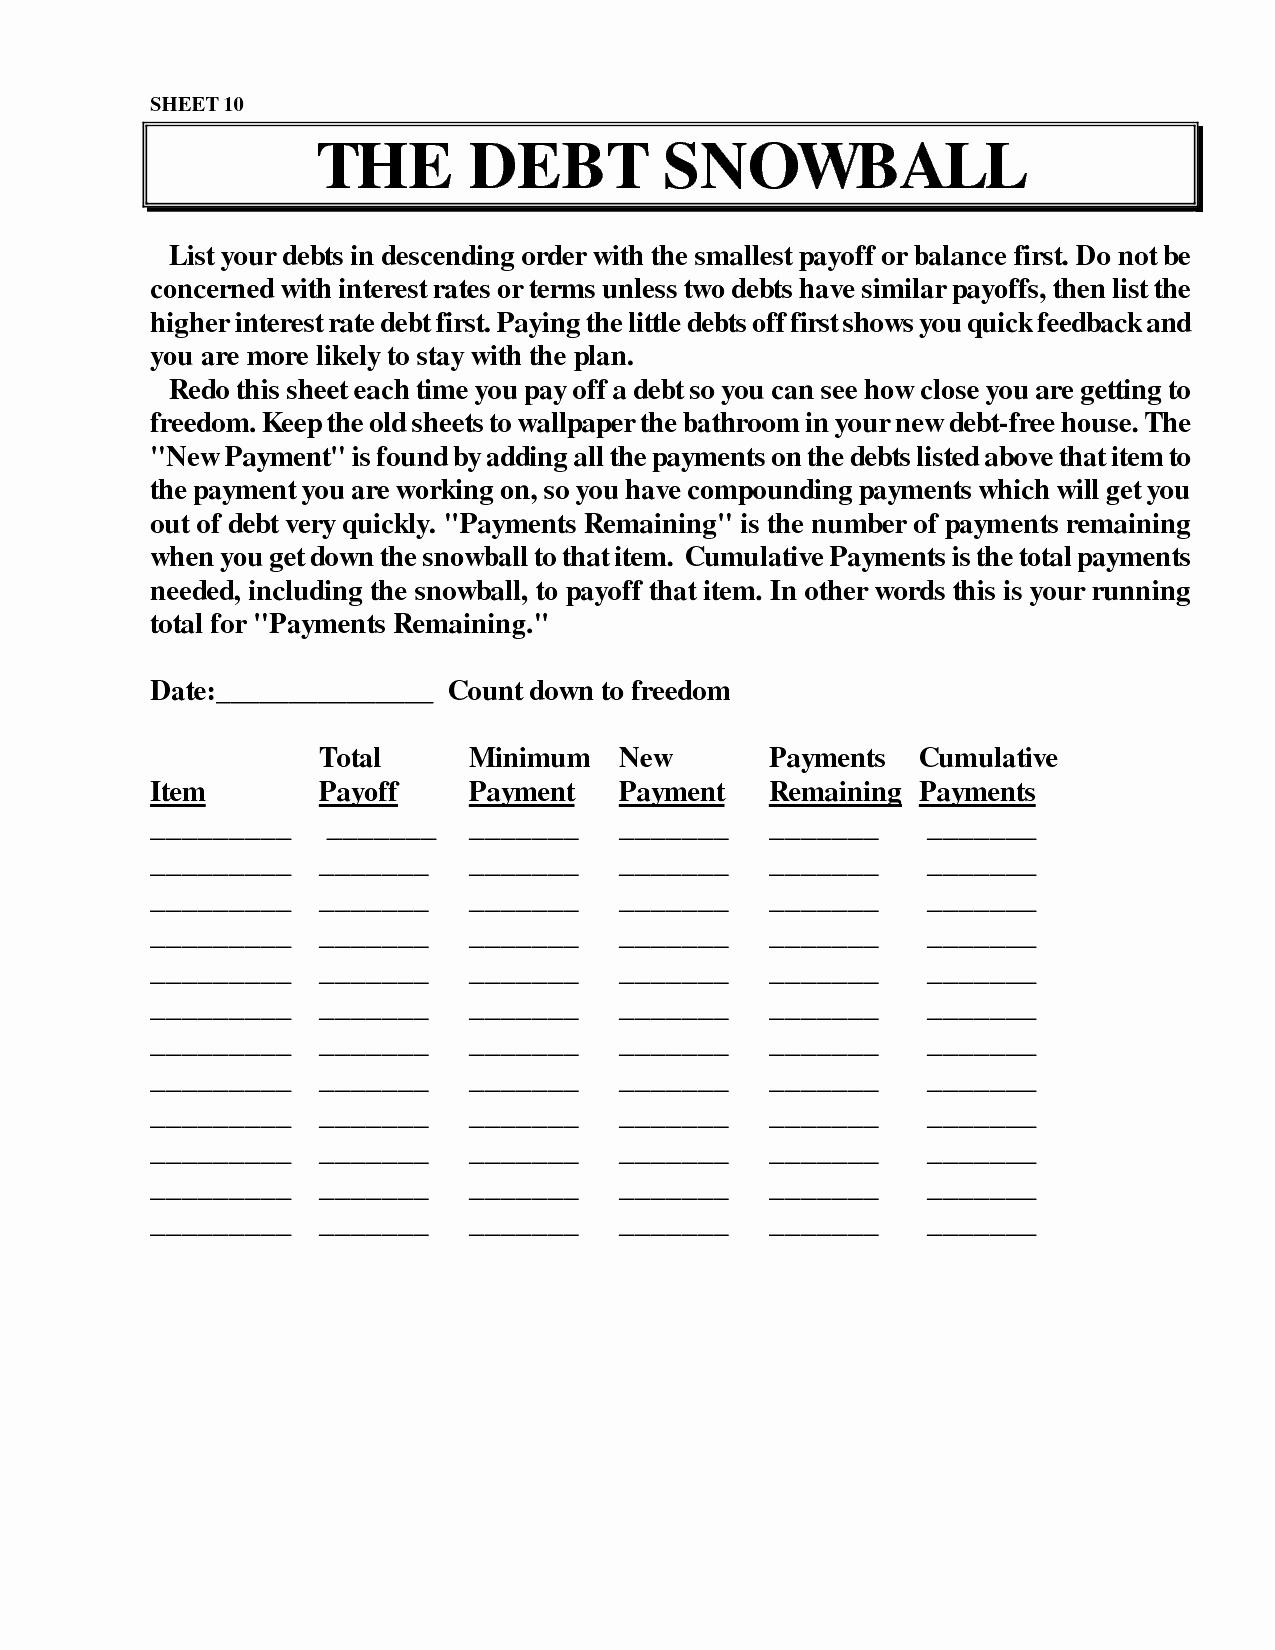 Ramsey Snowball Spreadsheet